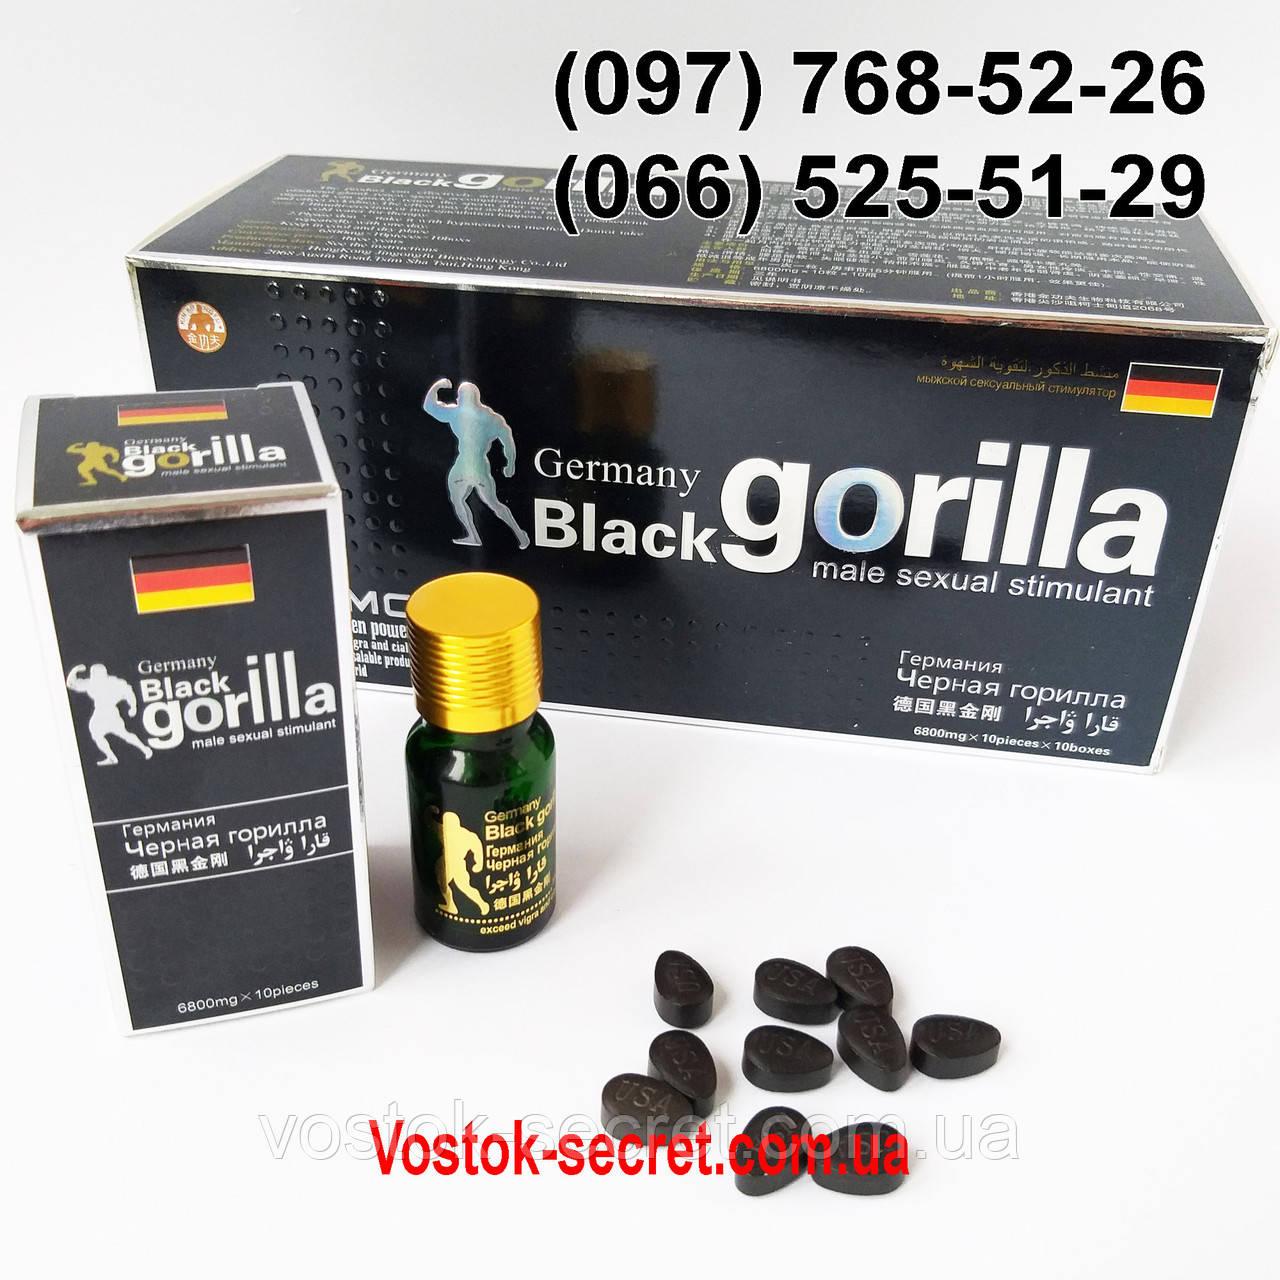 Препарат для потенции Black Gorilla- Черна Горилла, 10табл